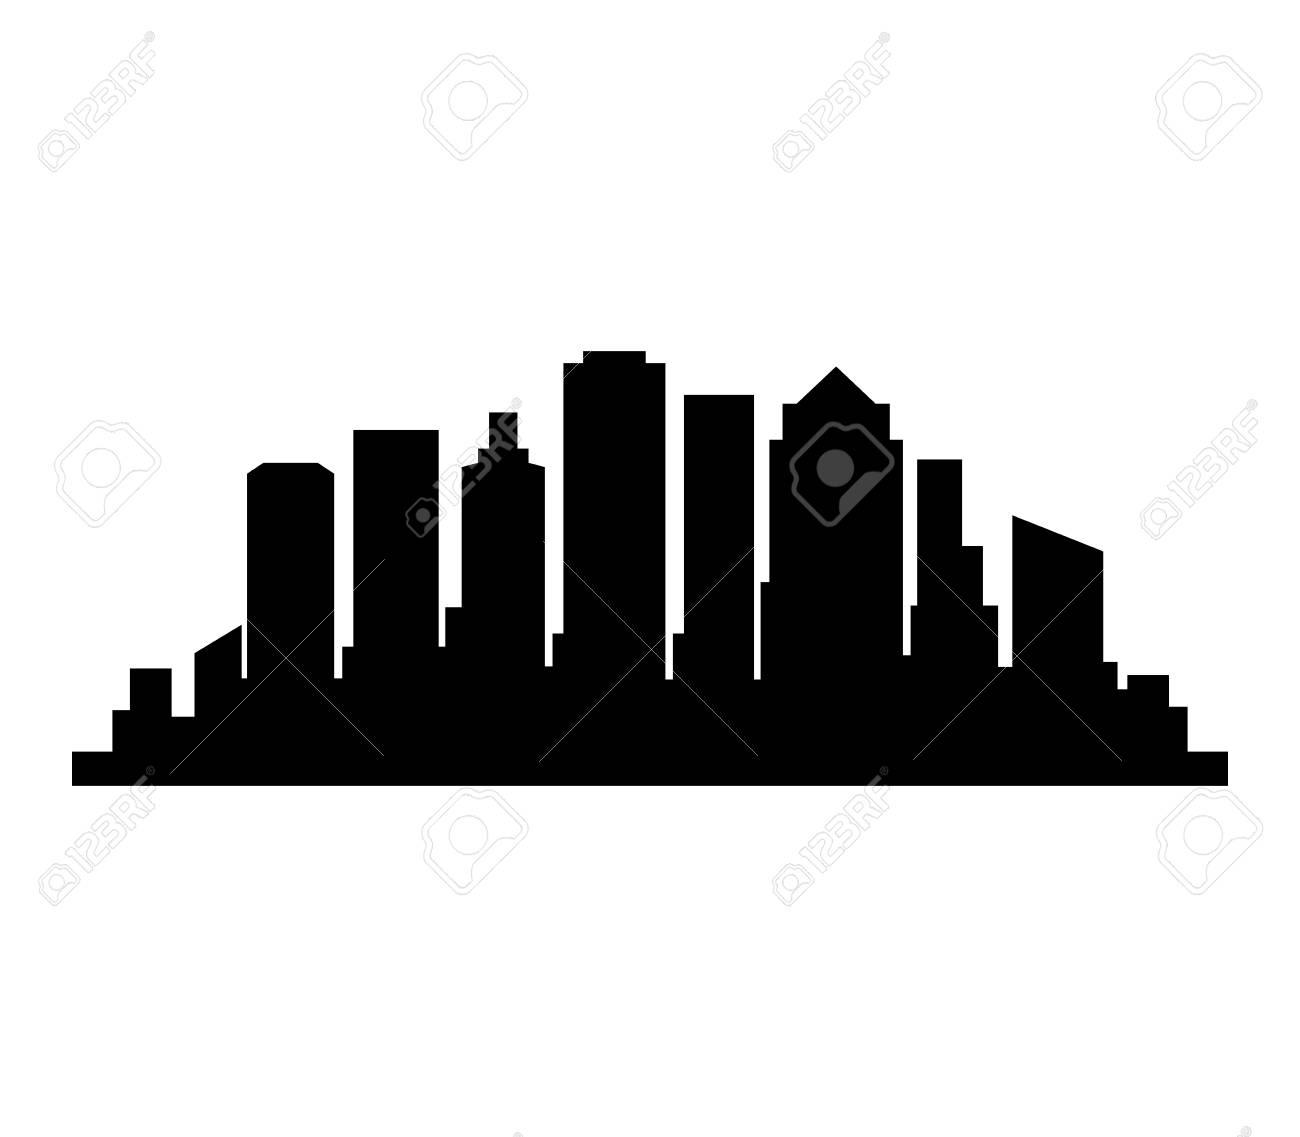 boston skyline royalty free cliparts vectors and stock rh 123rf com